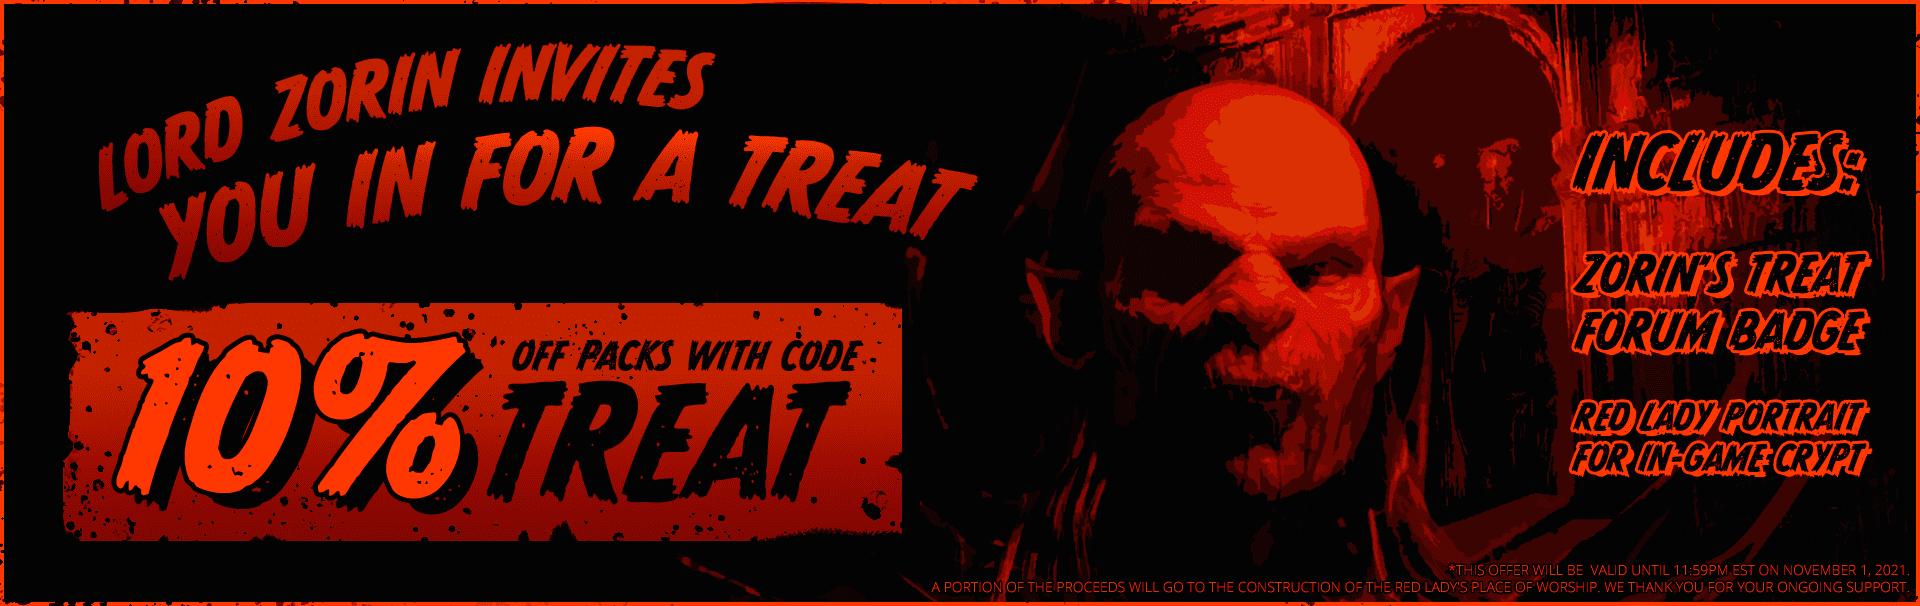 Code: TREAT